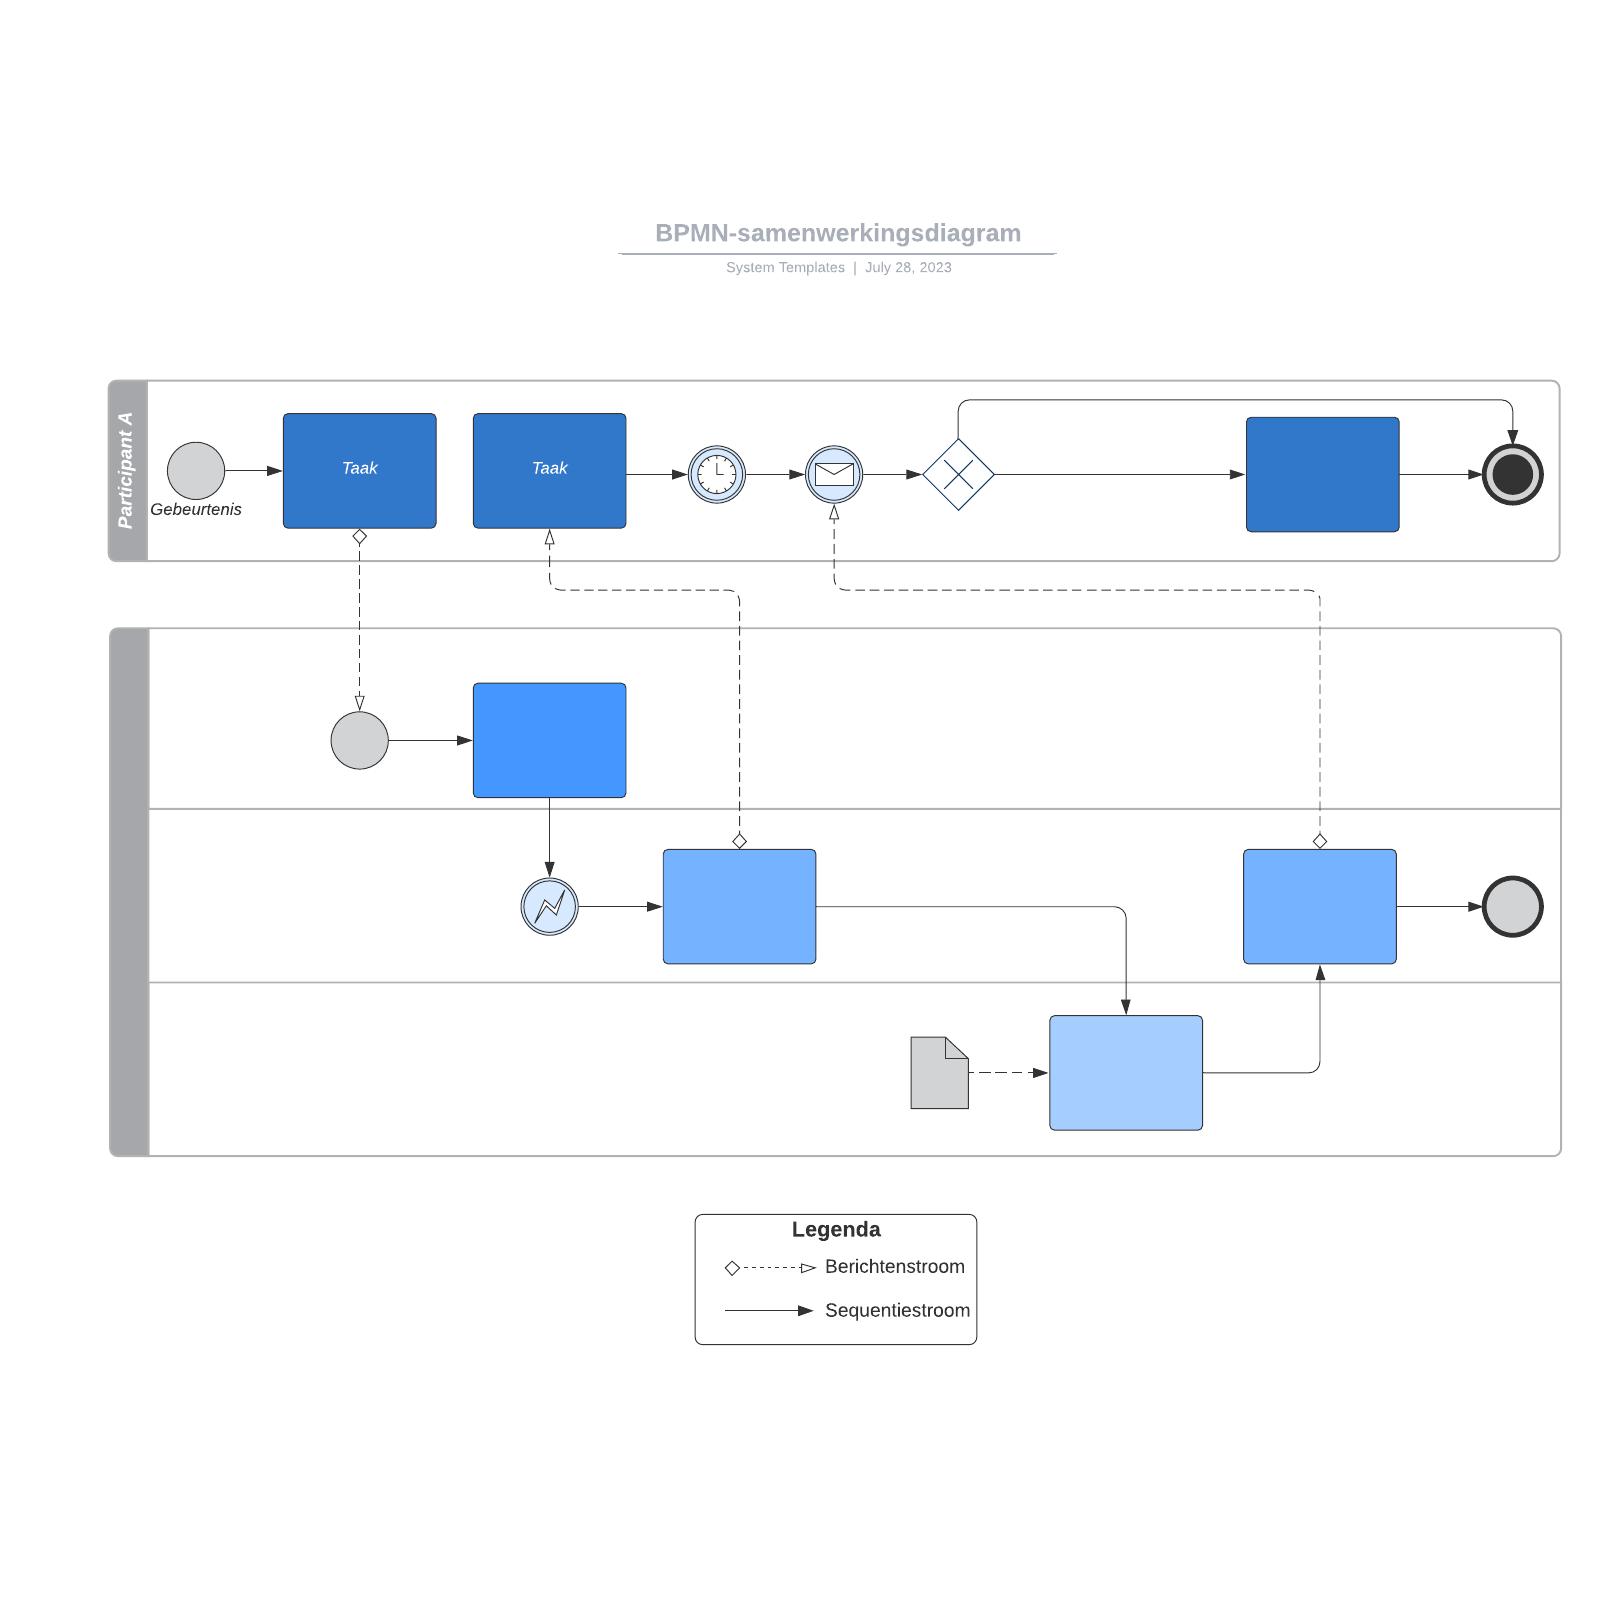 BPMN-samenwerkingsdiagram